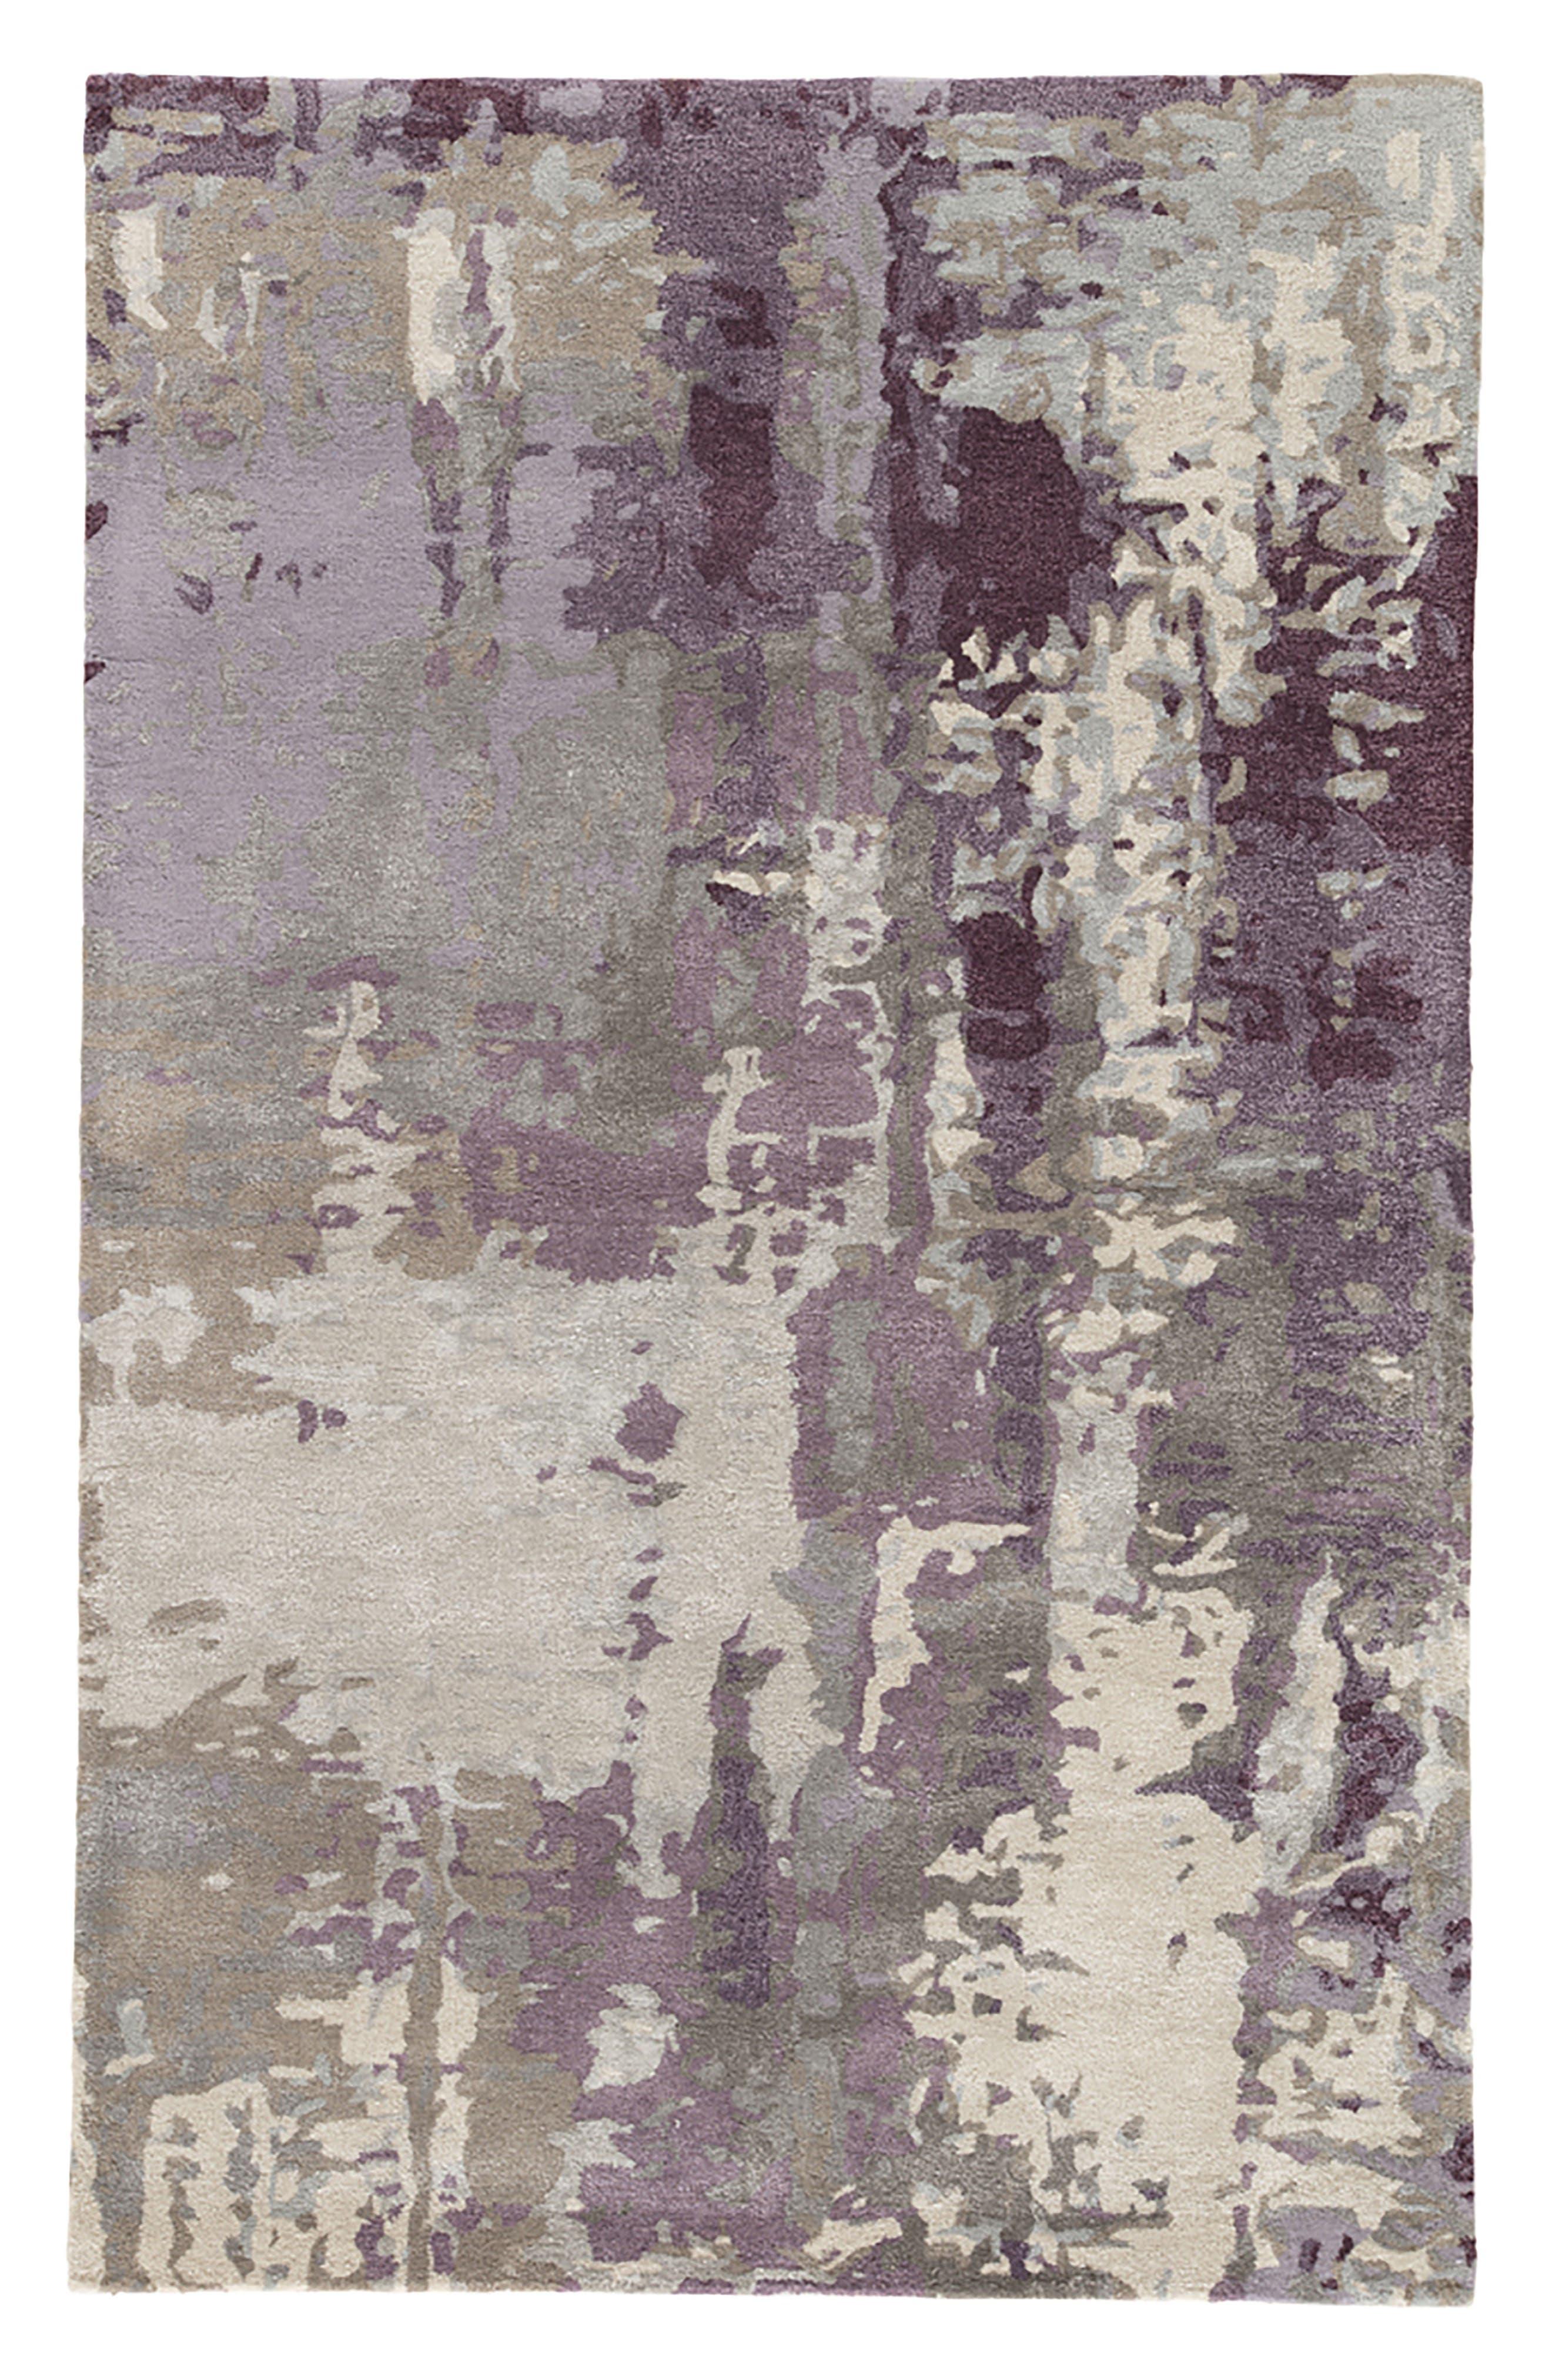 Genesis - Matcha Hand Tufted Rug,                         Main,                         color, 020